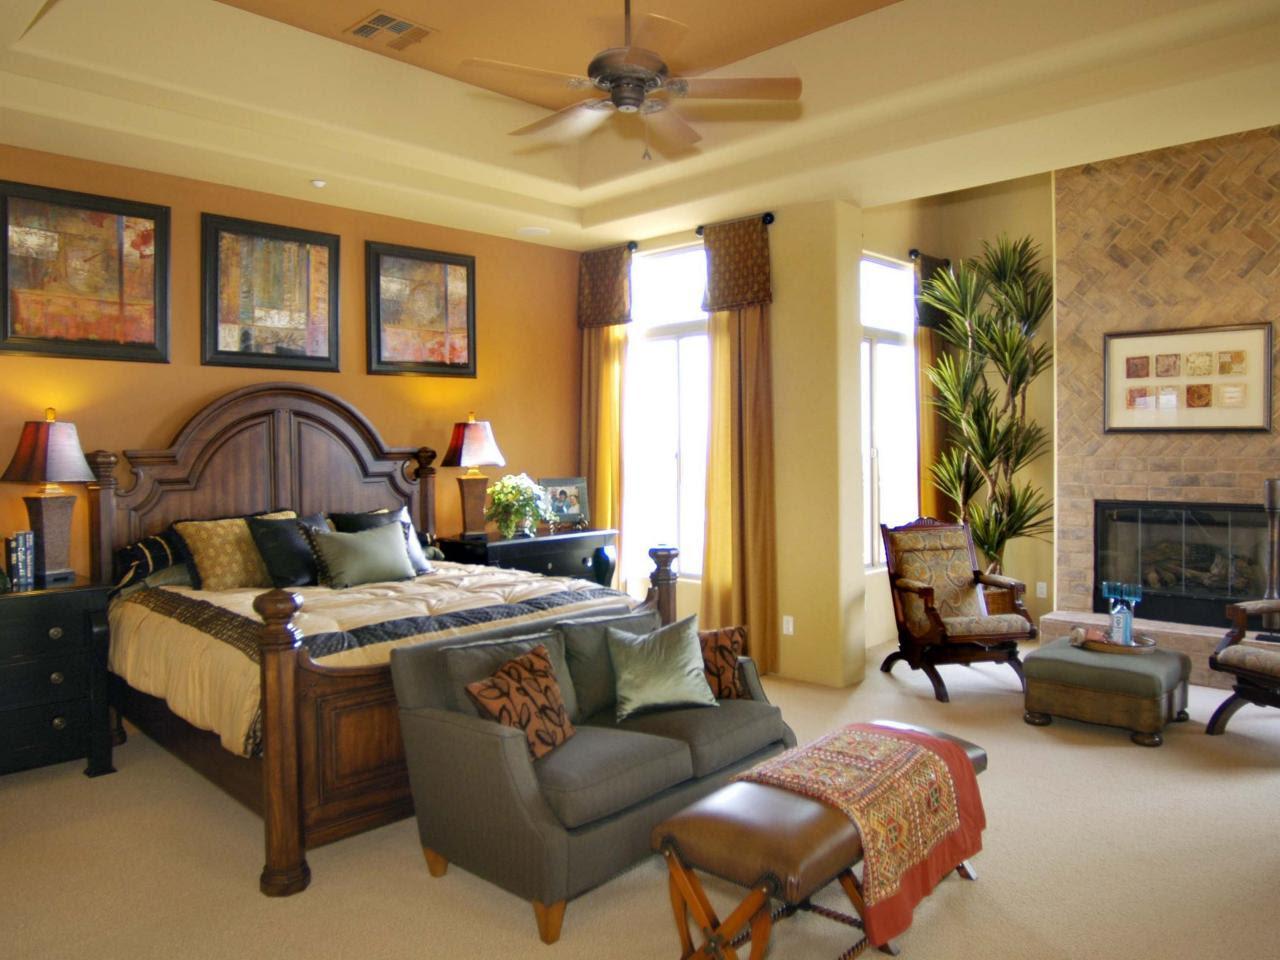 Yellow Master Bedroom Photos | HGTV